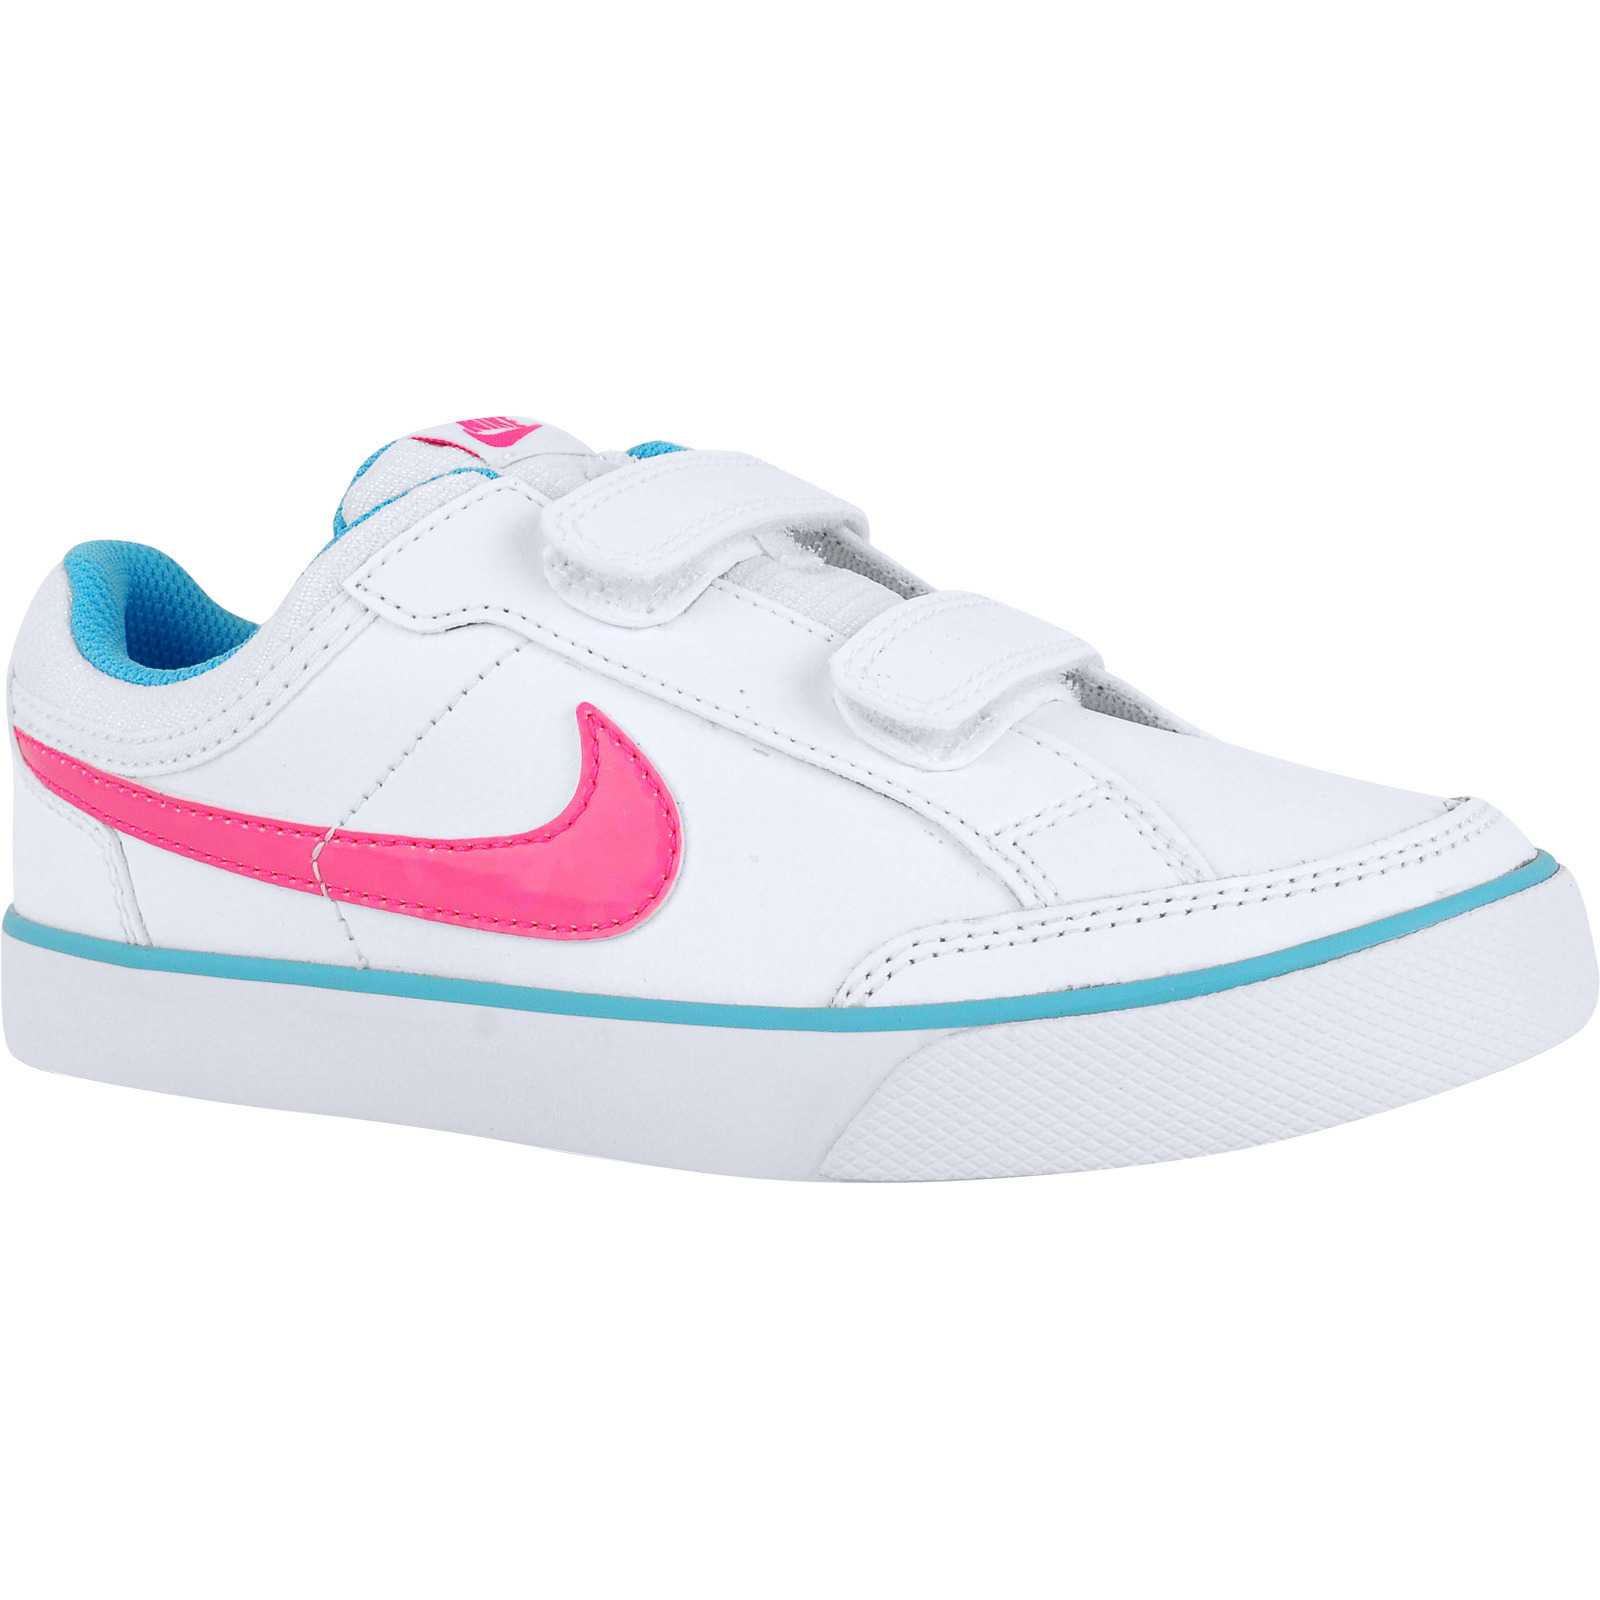 Pantofi casual copii Nike Capri 3 579952-104